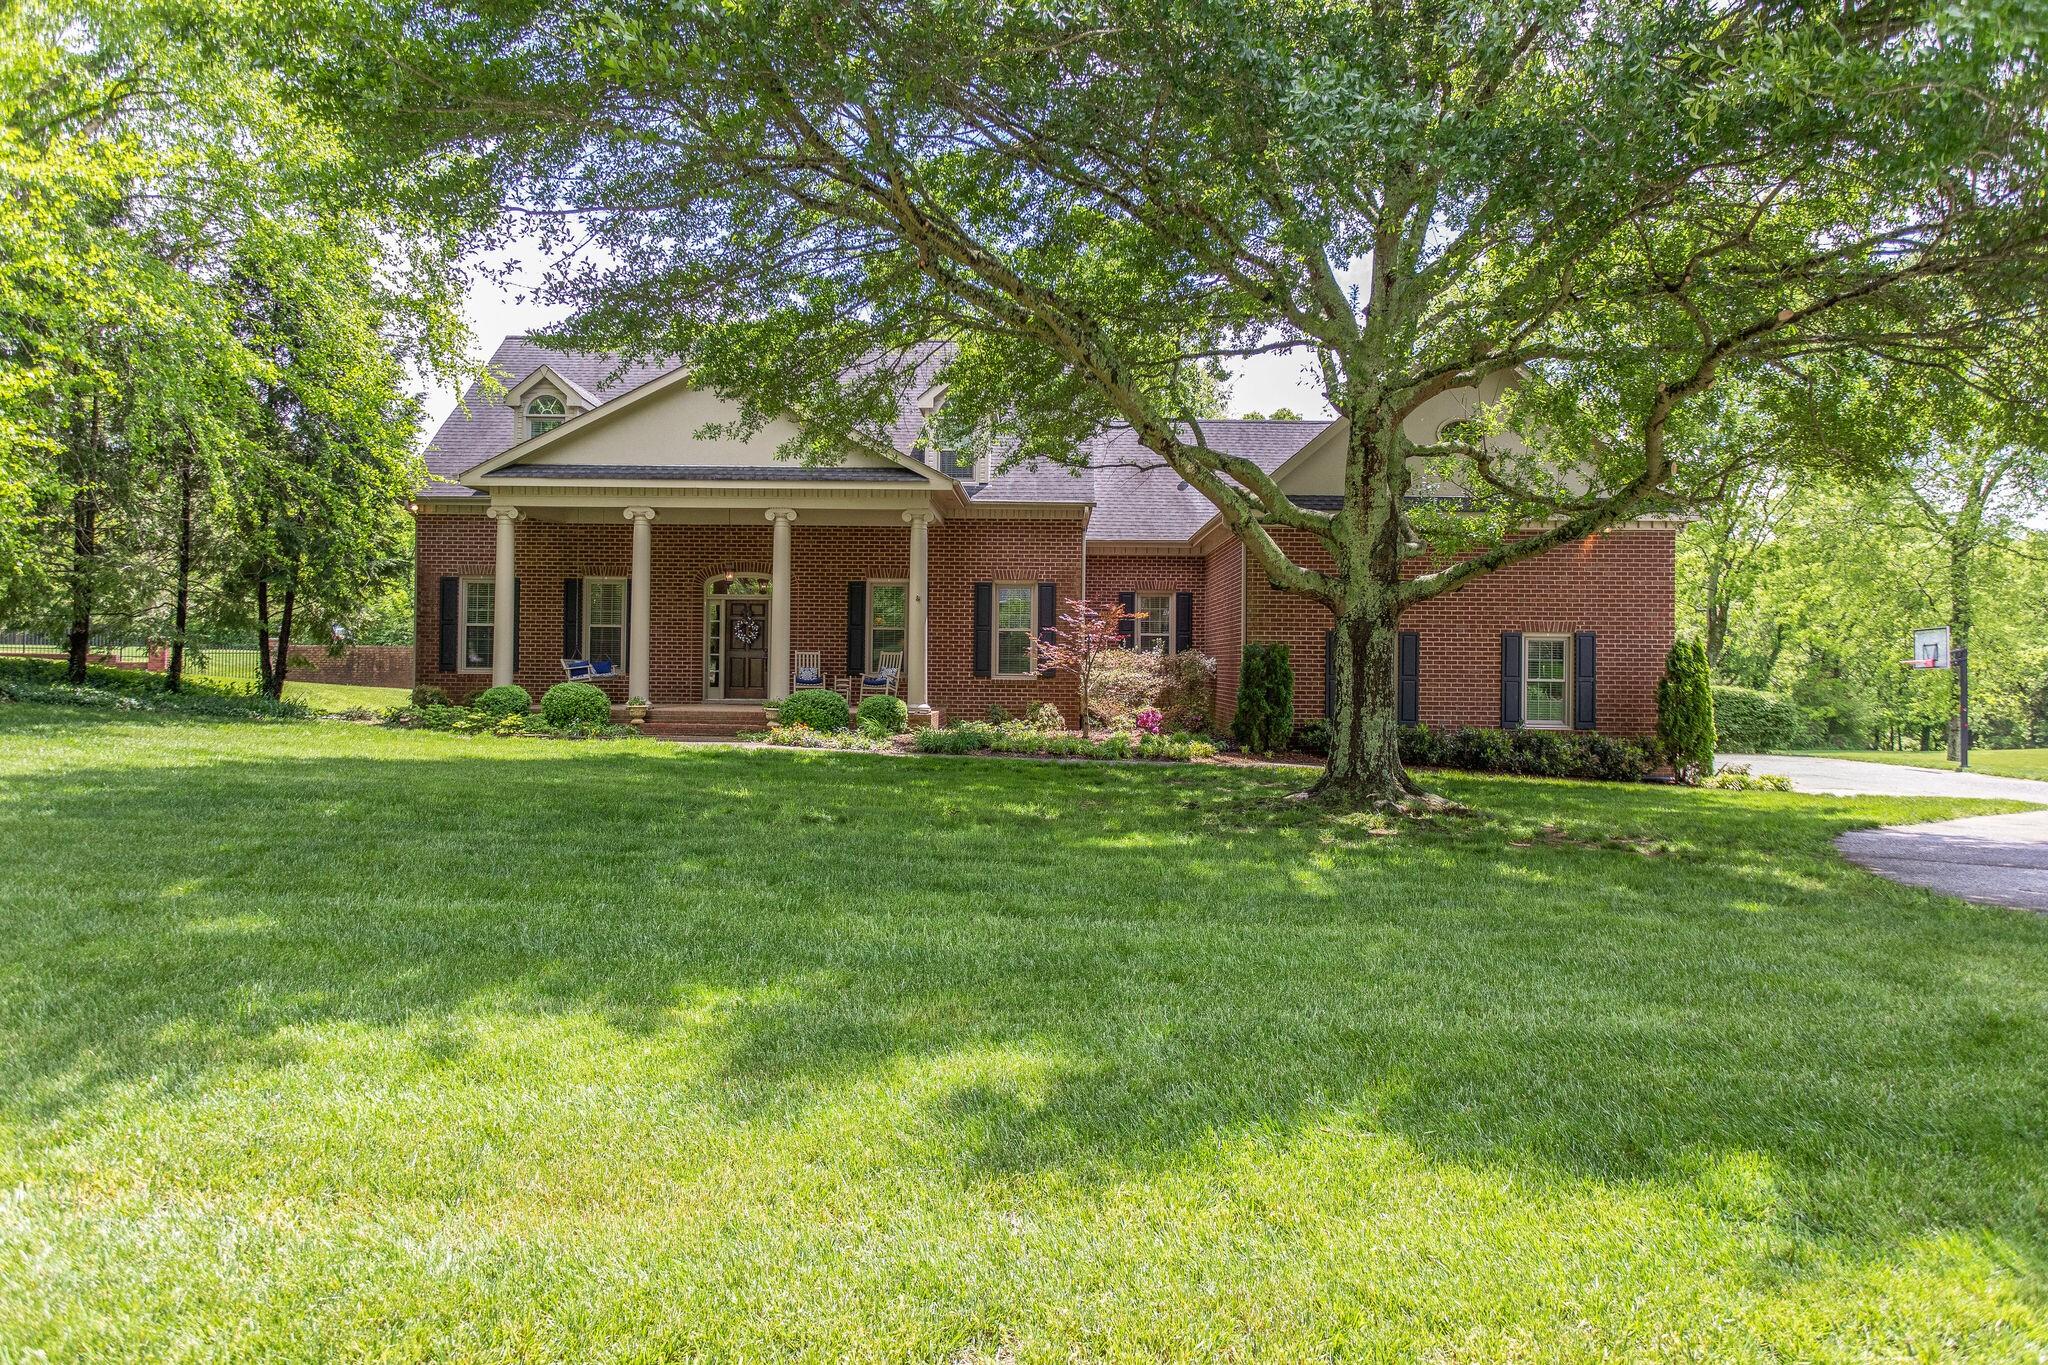 2913 POLO CLUB RD Property Photo - Nashville, TN real estate listing